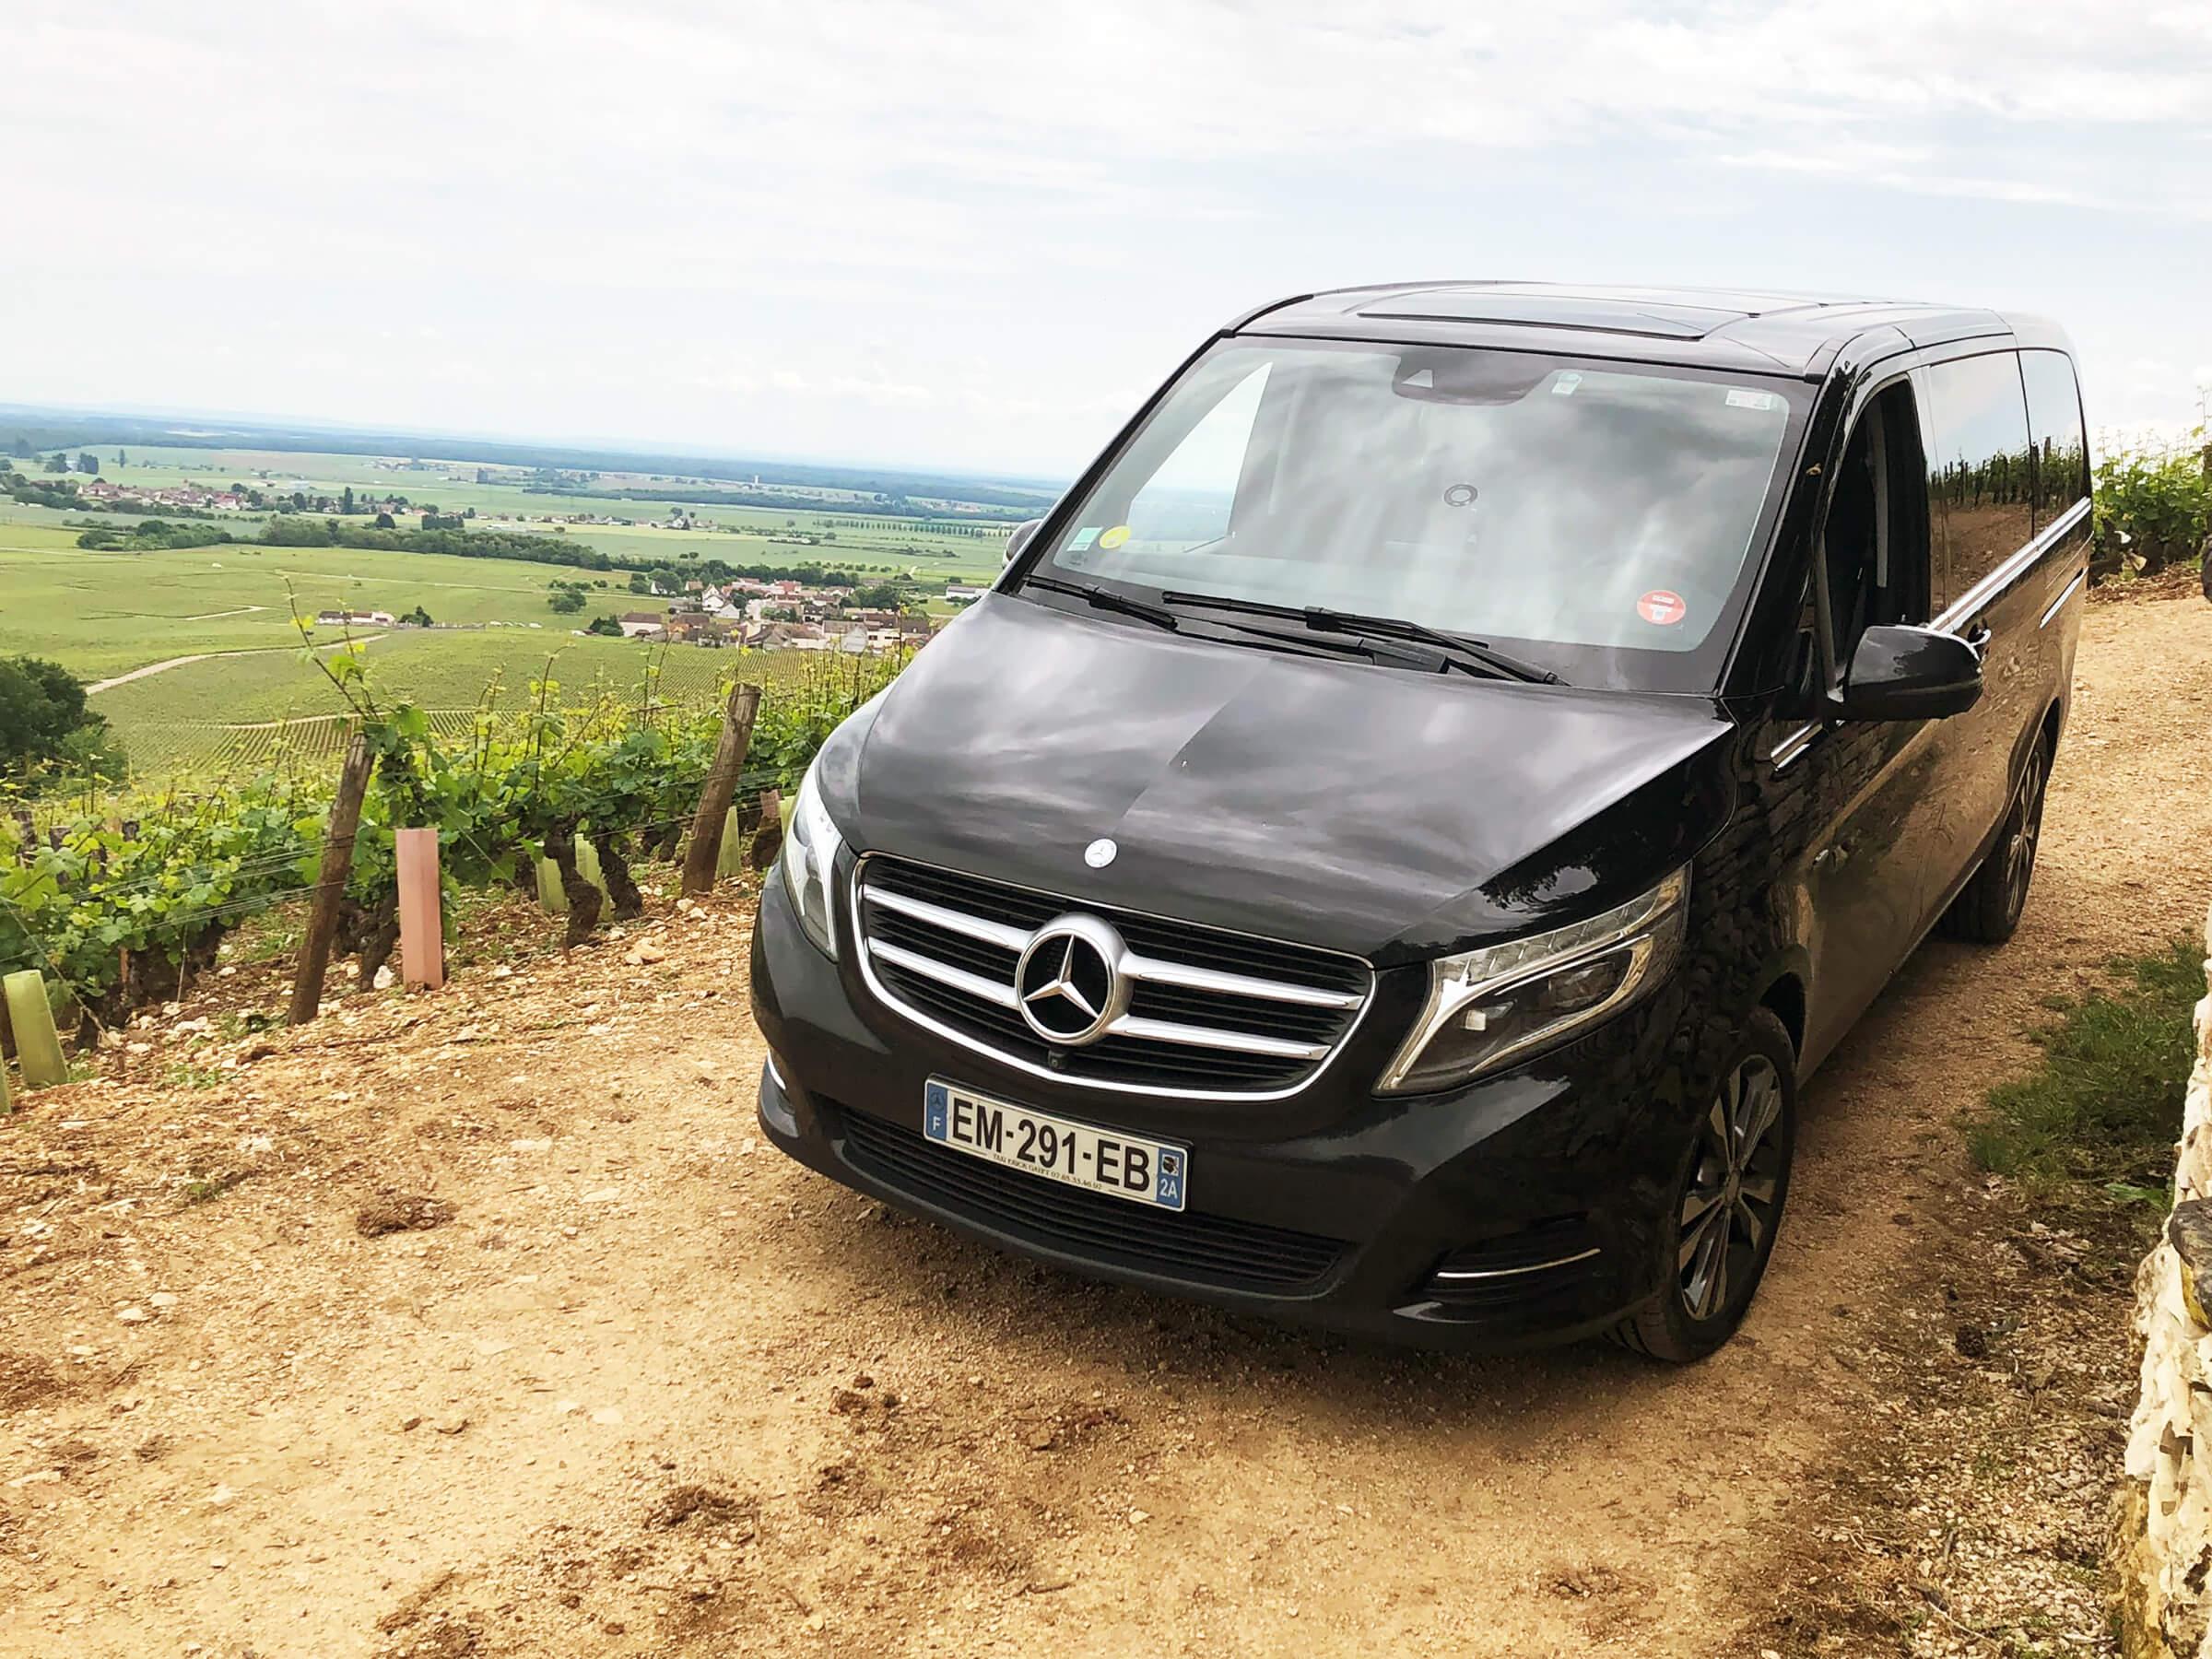 bourgogne-discovery-transport-prive-de-personne-visite-domaine-viticole-bourgogne-france-franche-comte-professionnel